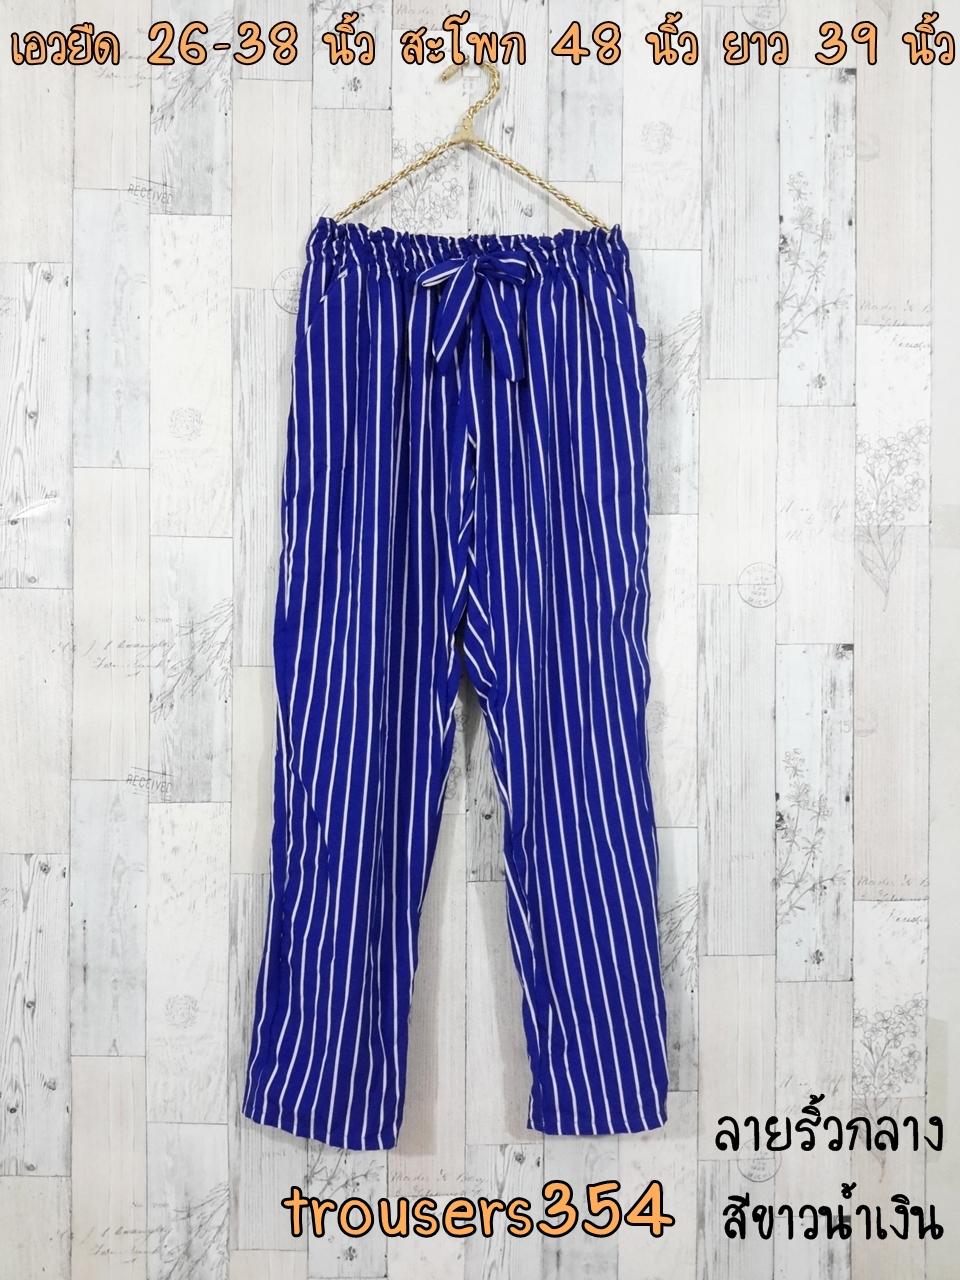 trousers354 กางเกงขายาวผ้าไหมอิตาลีเอวยืด 26-38 นิ้ว ลายริ้วกลางสีขาวน้ำเงิน